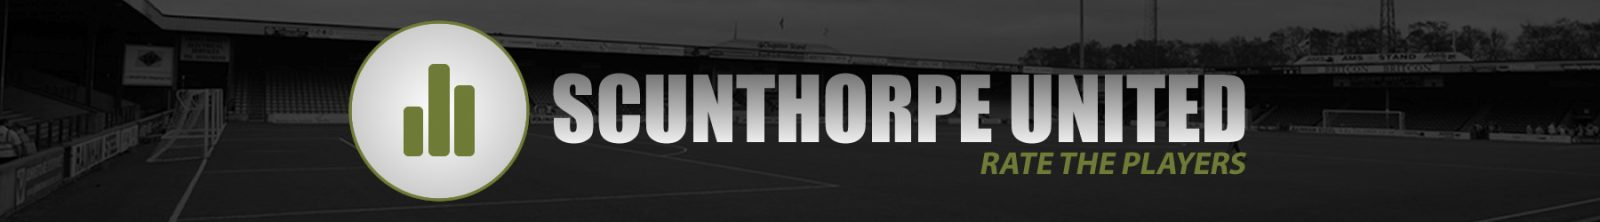 Rate Scunthorpe United